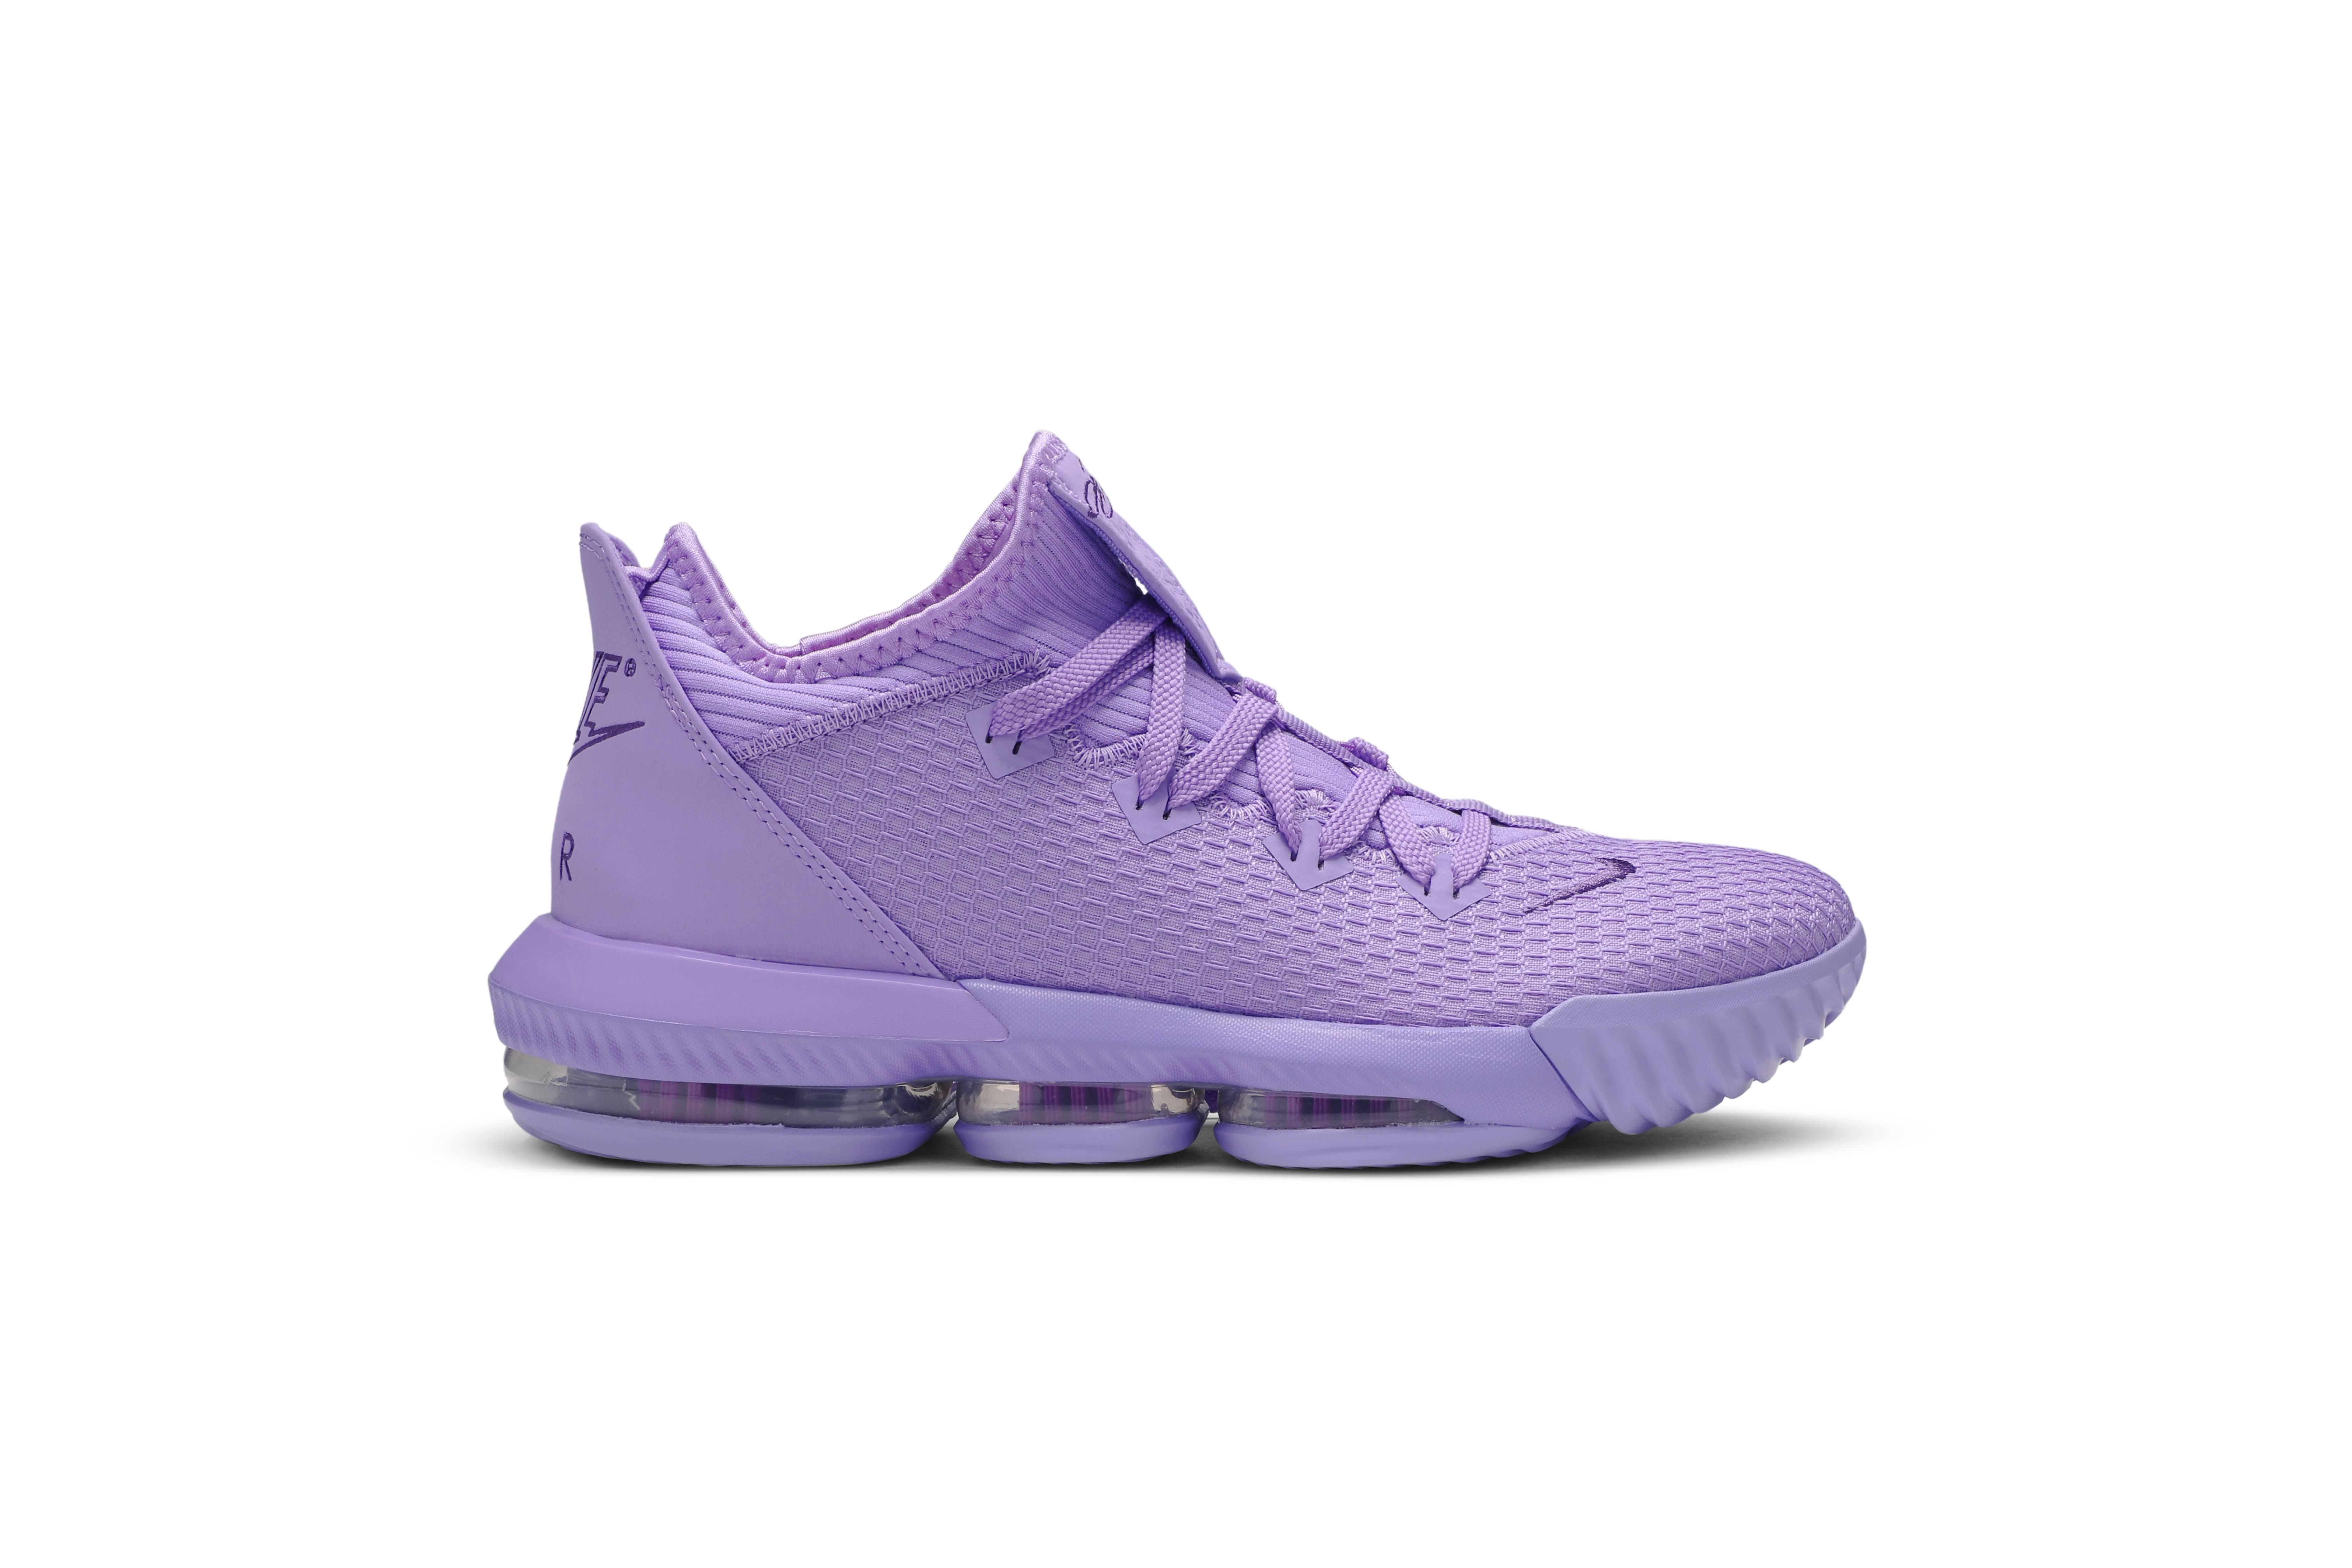 Nike LeBron 16 Low 'Atomic Purple